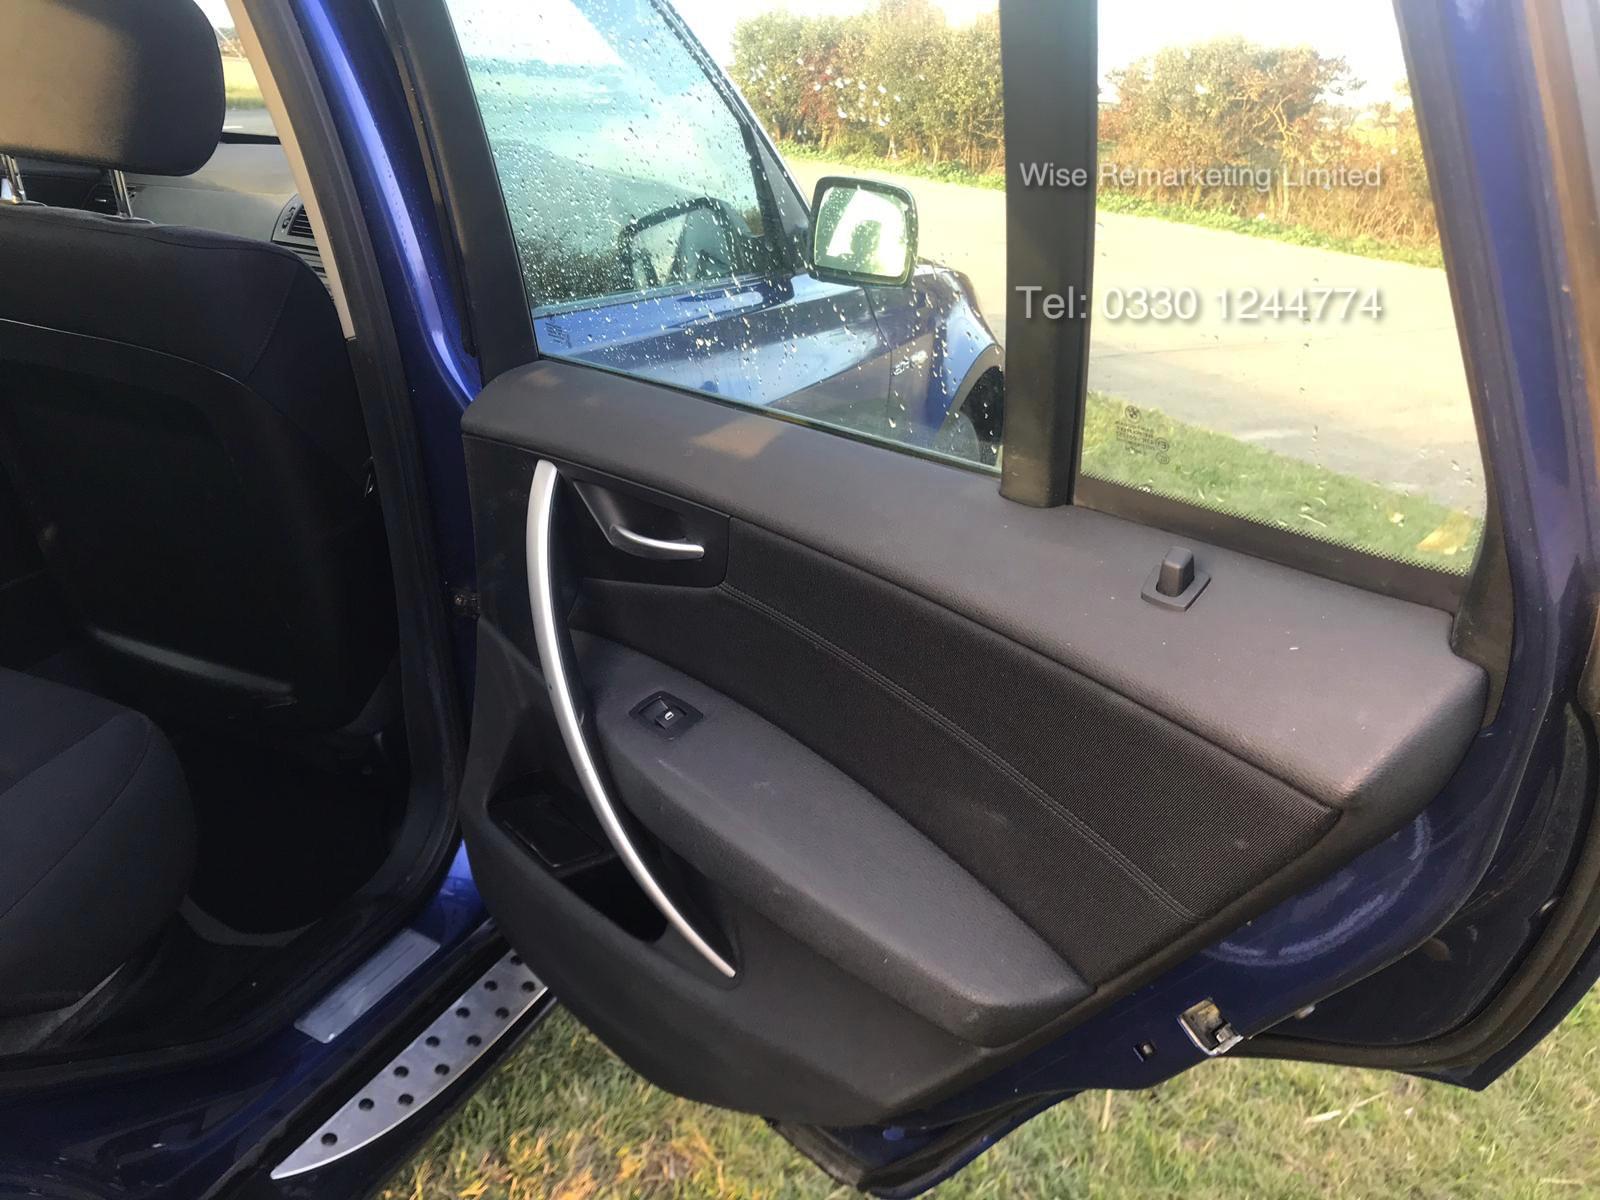 Lot 24 - BMW X3 2.0d Special Equipment - 2007 Model - 4x4 - Metallic Blue